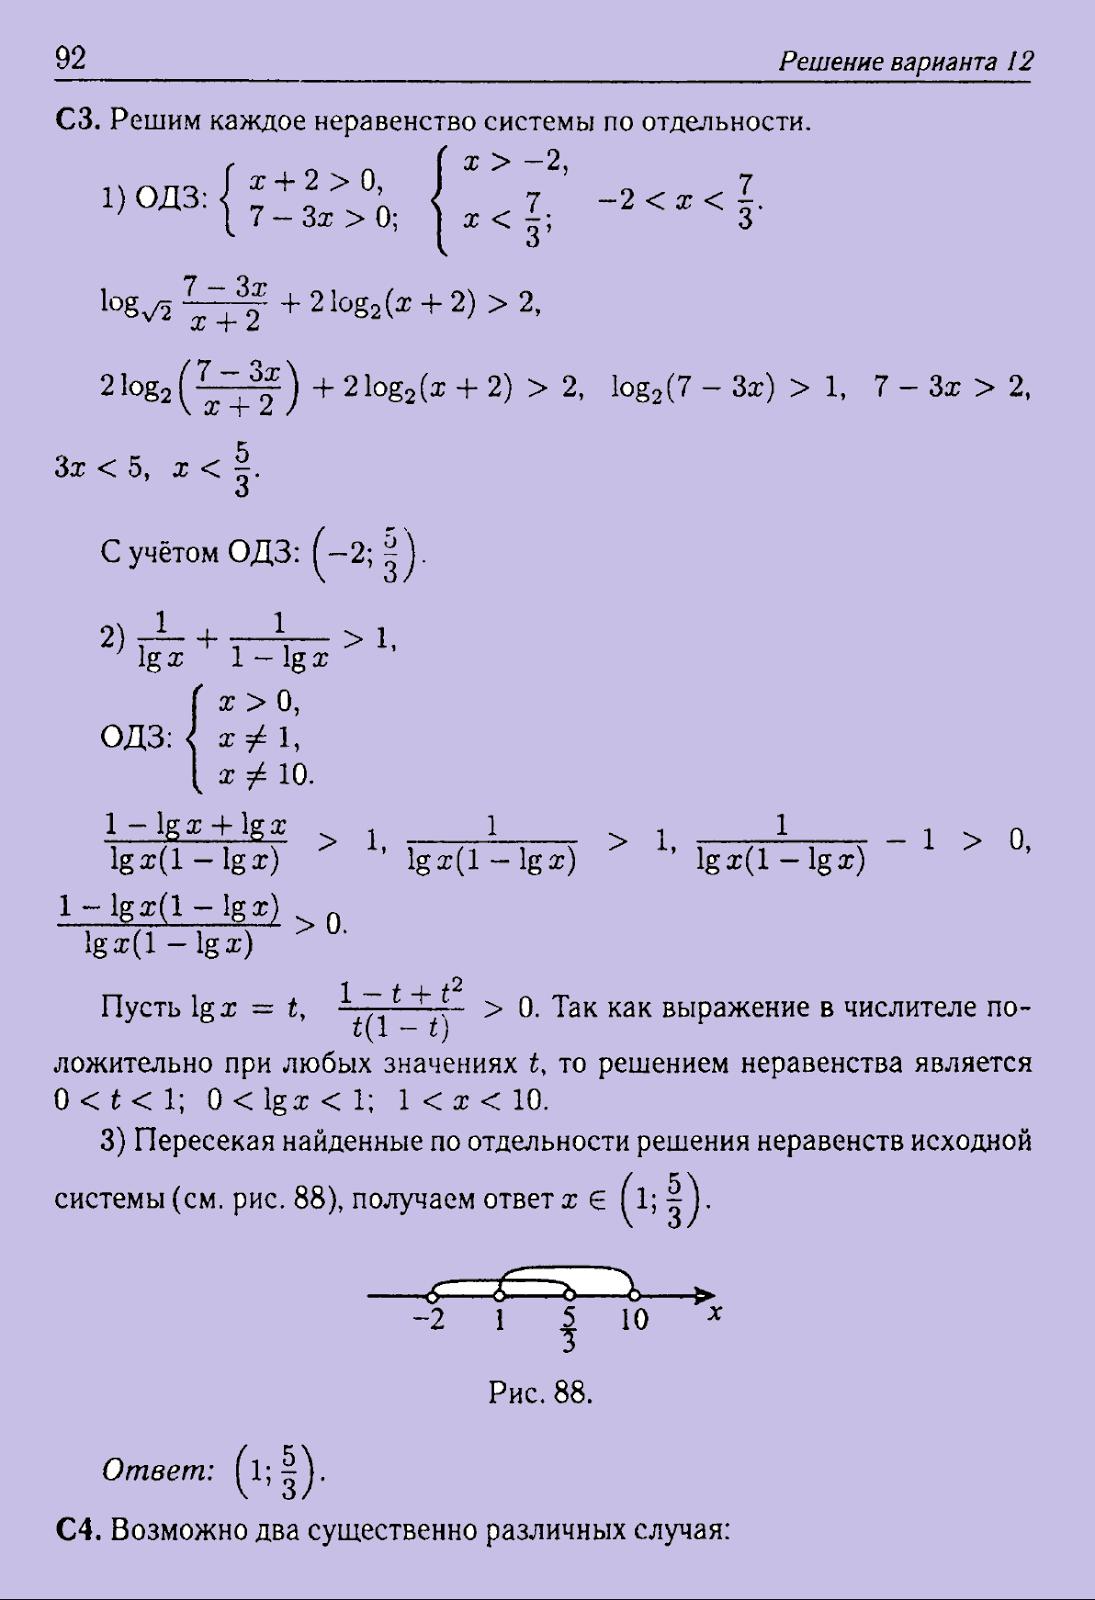 курс элементарной математики решебник